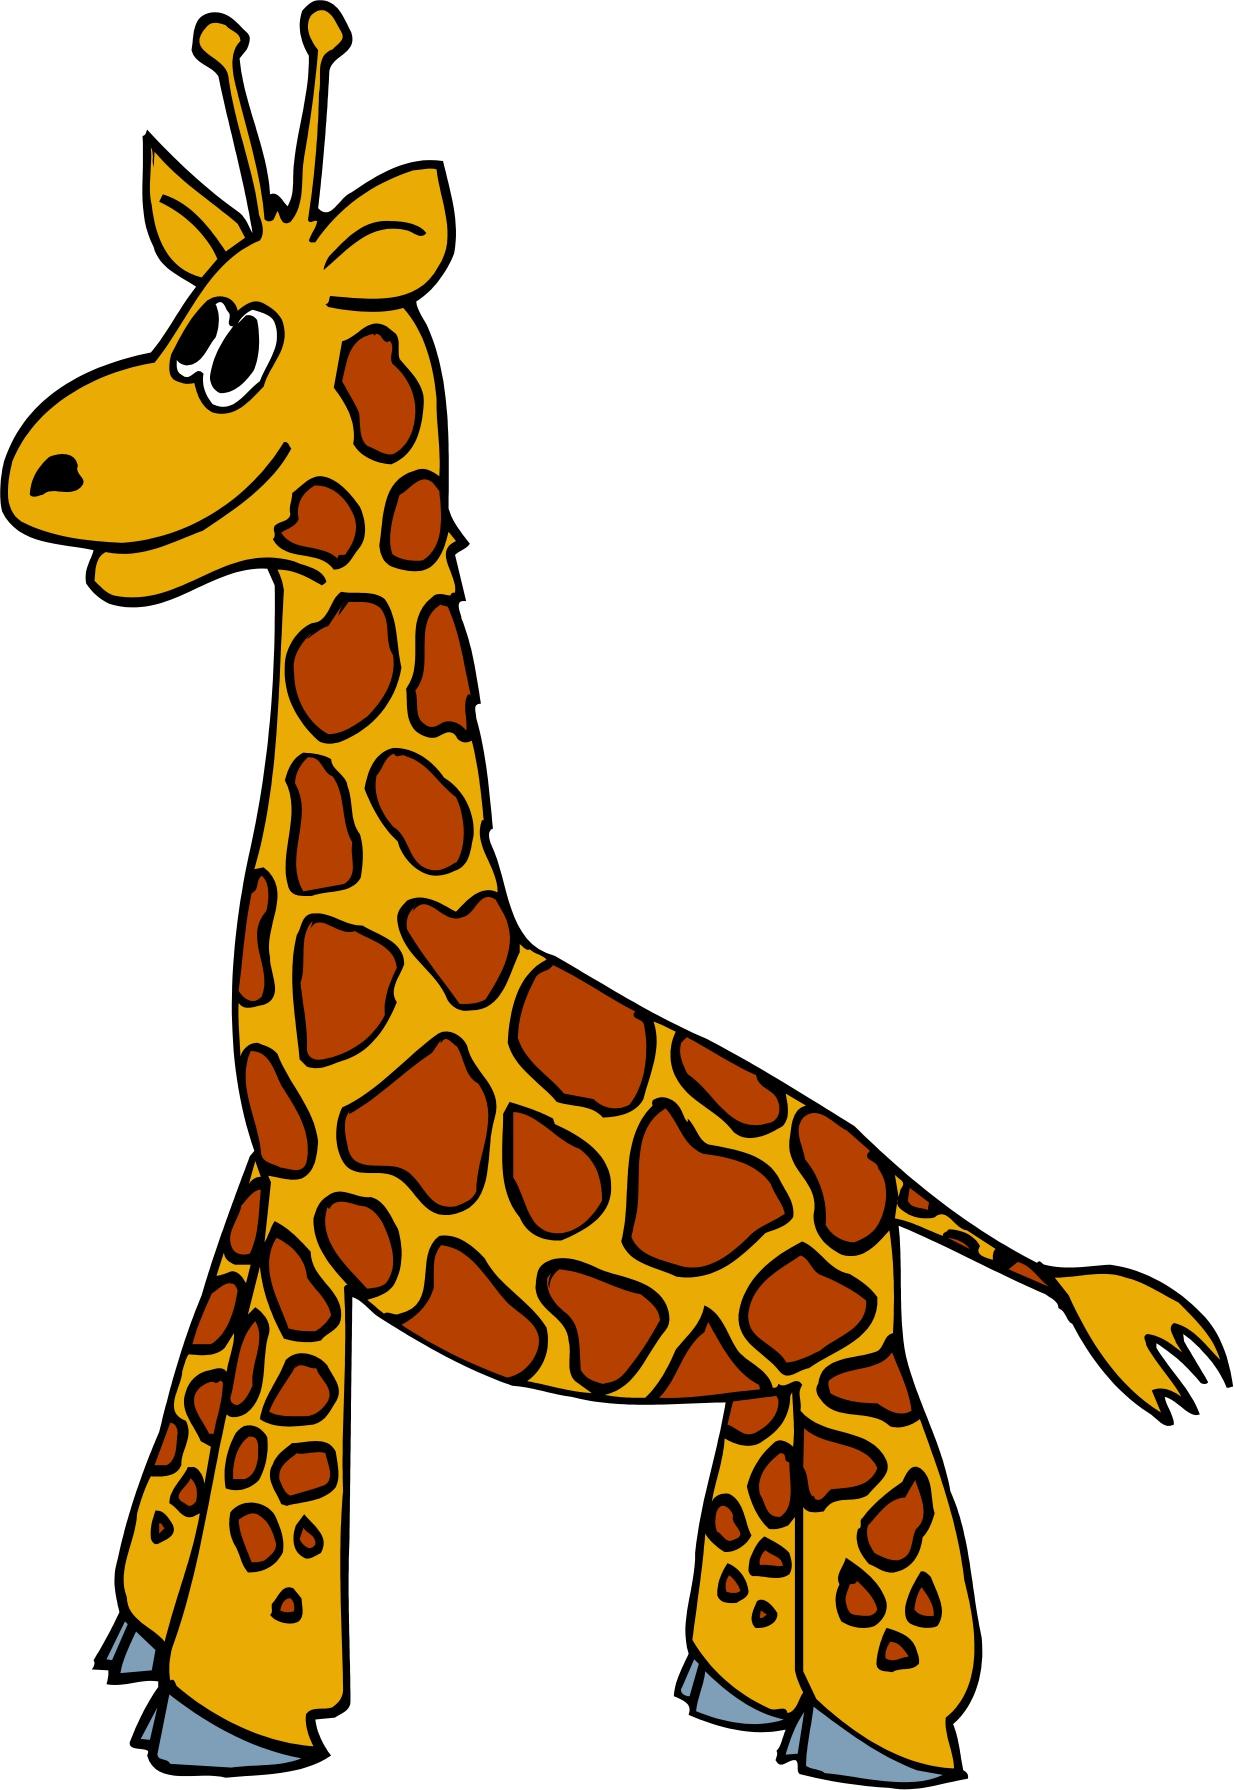 Baby giraffe free giraffe clipart